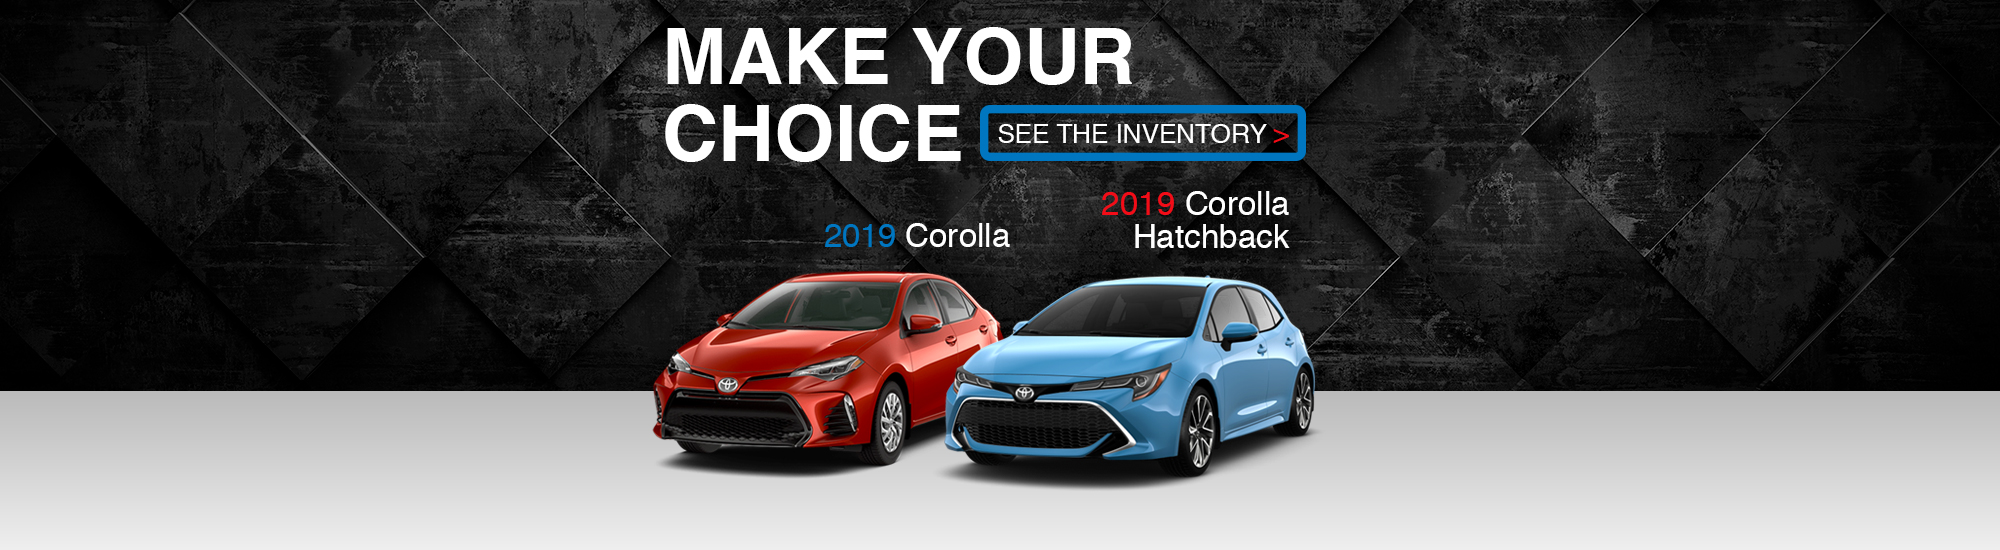 Corolla's 2019